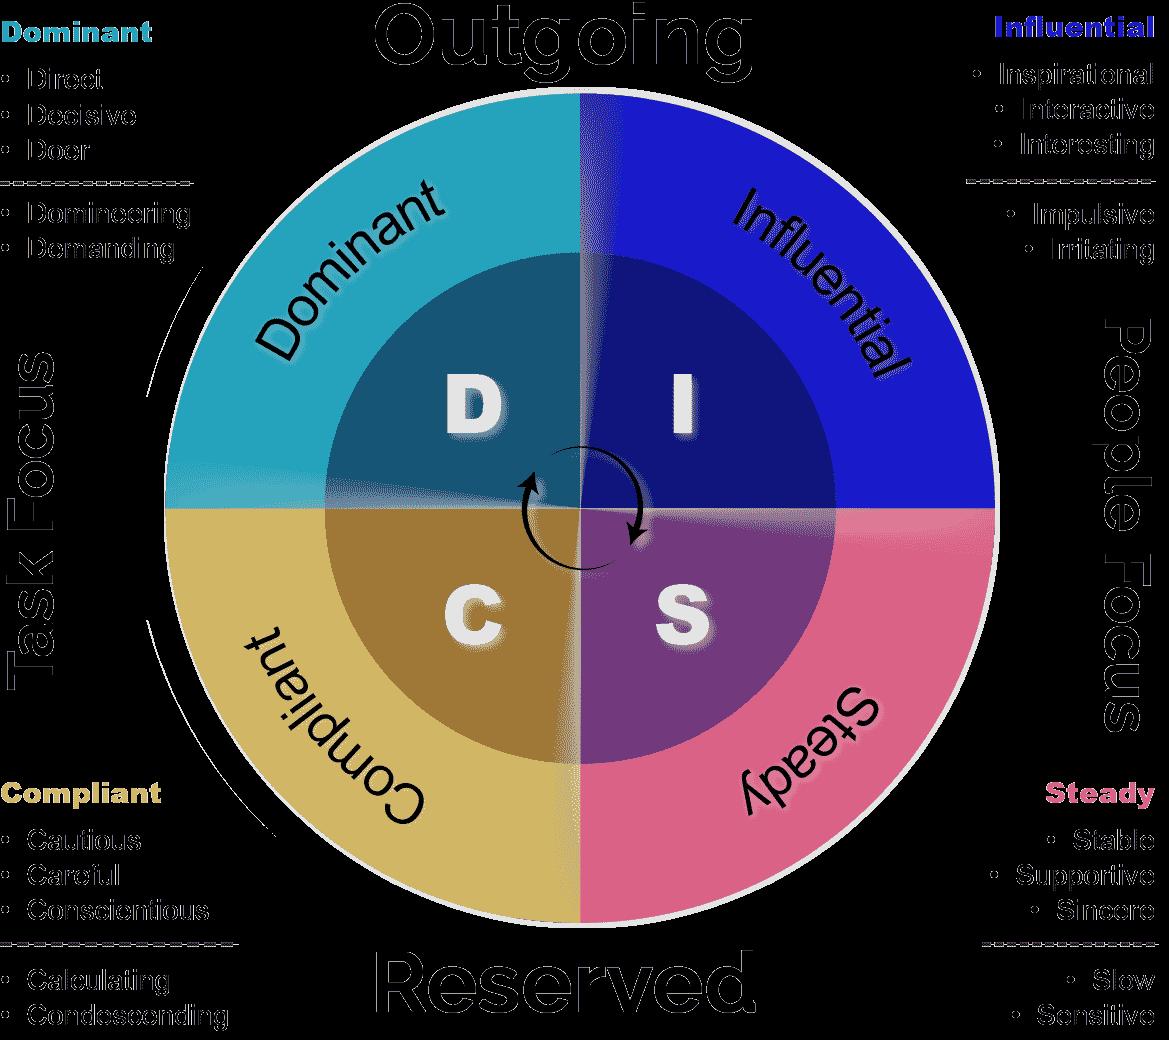 DISC chart